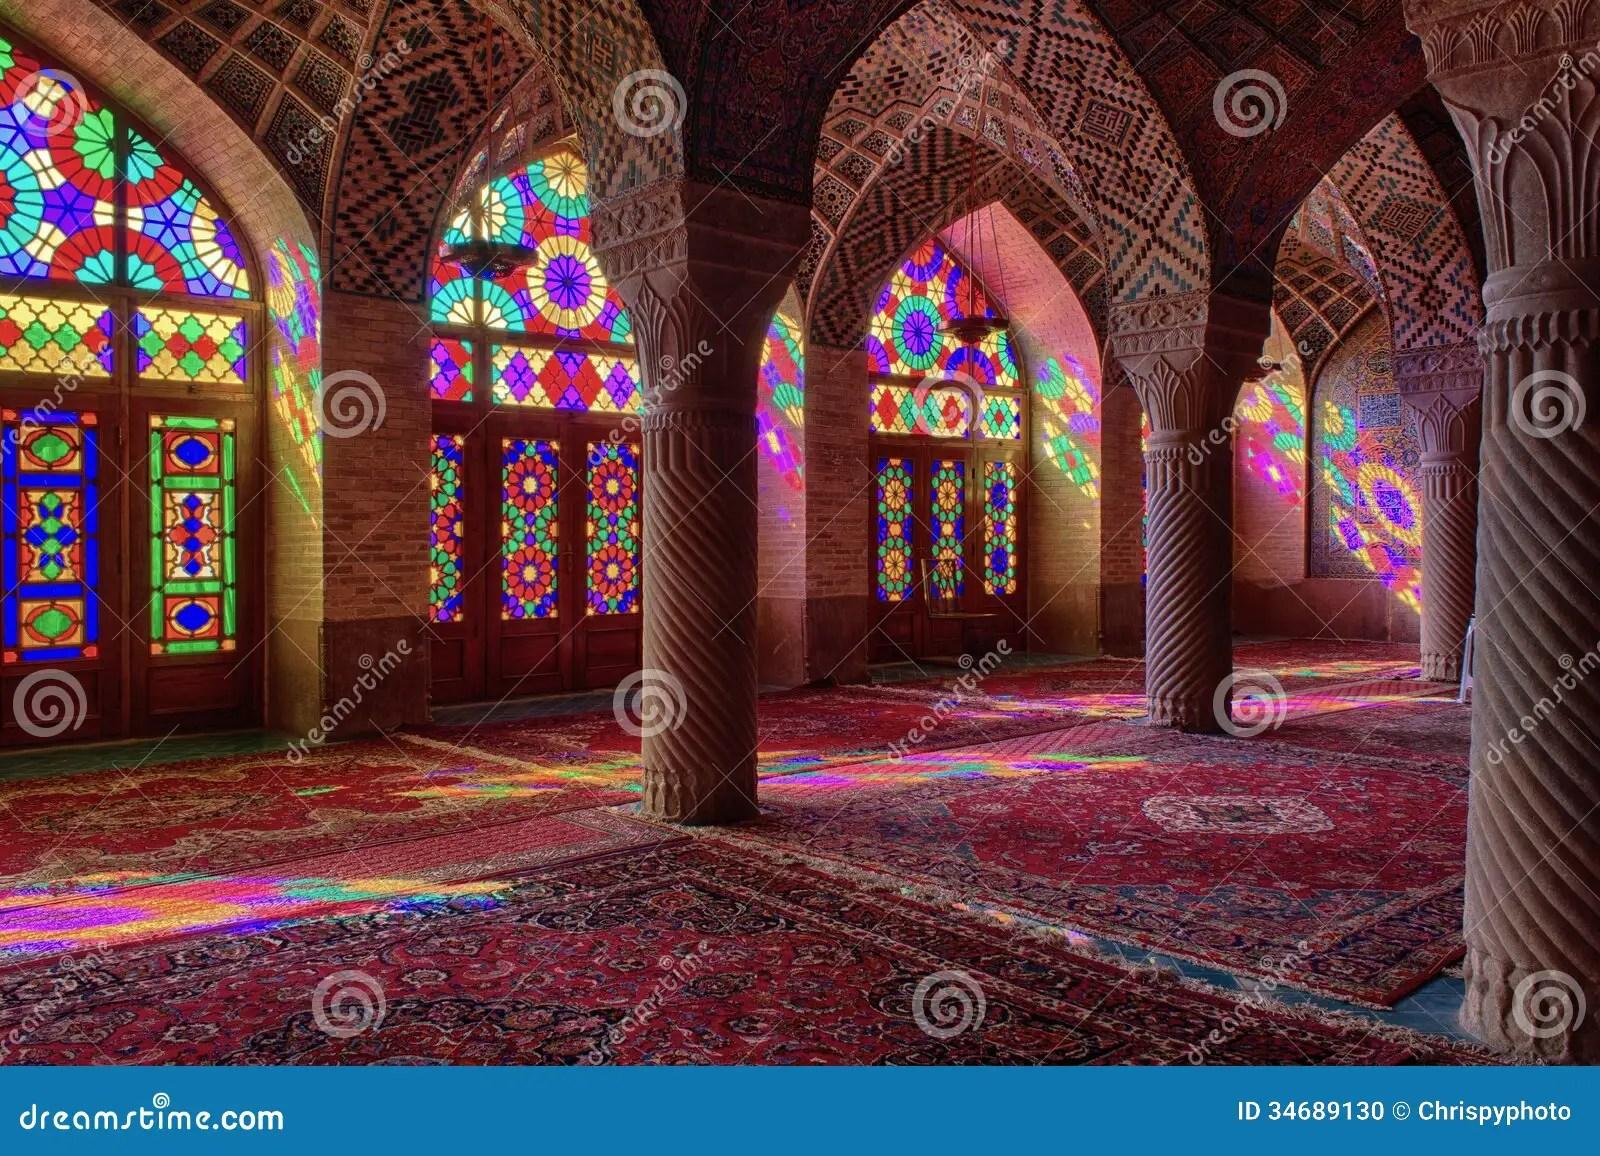 Beautiful Islamic Wallpapers Hd Hdr Of Nasir Al Mulk Mosque In Shiraz Iran Stock Photo